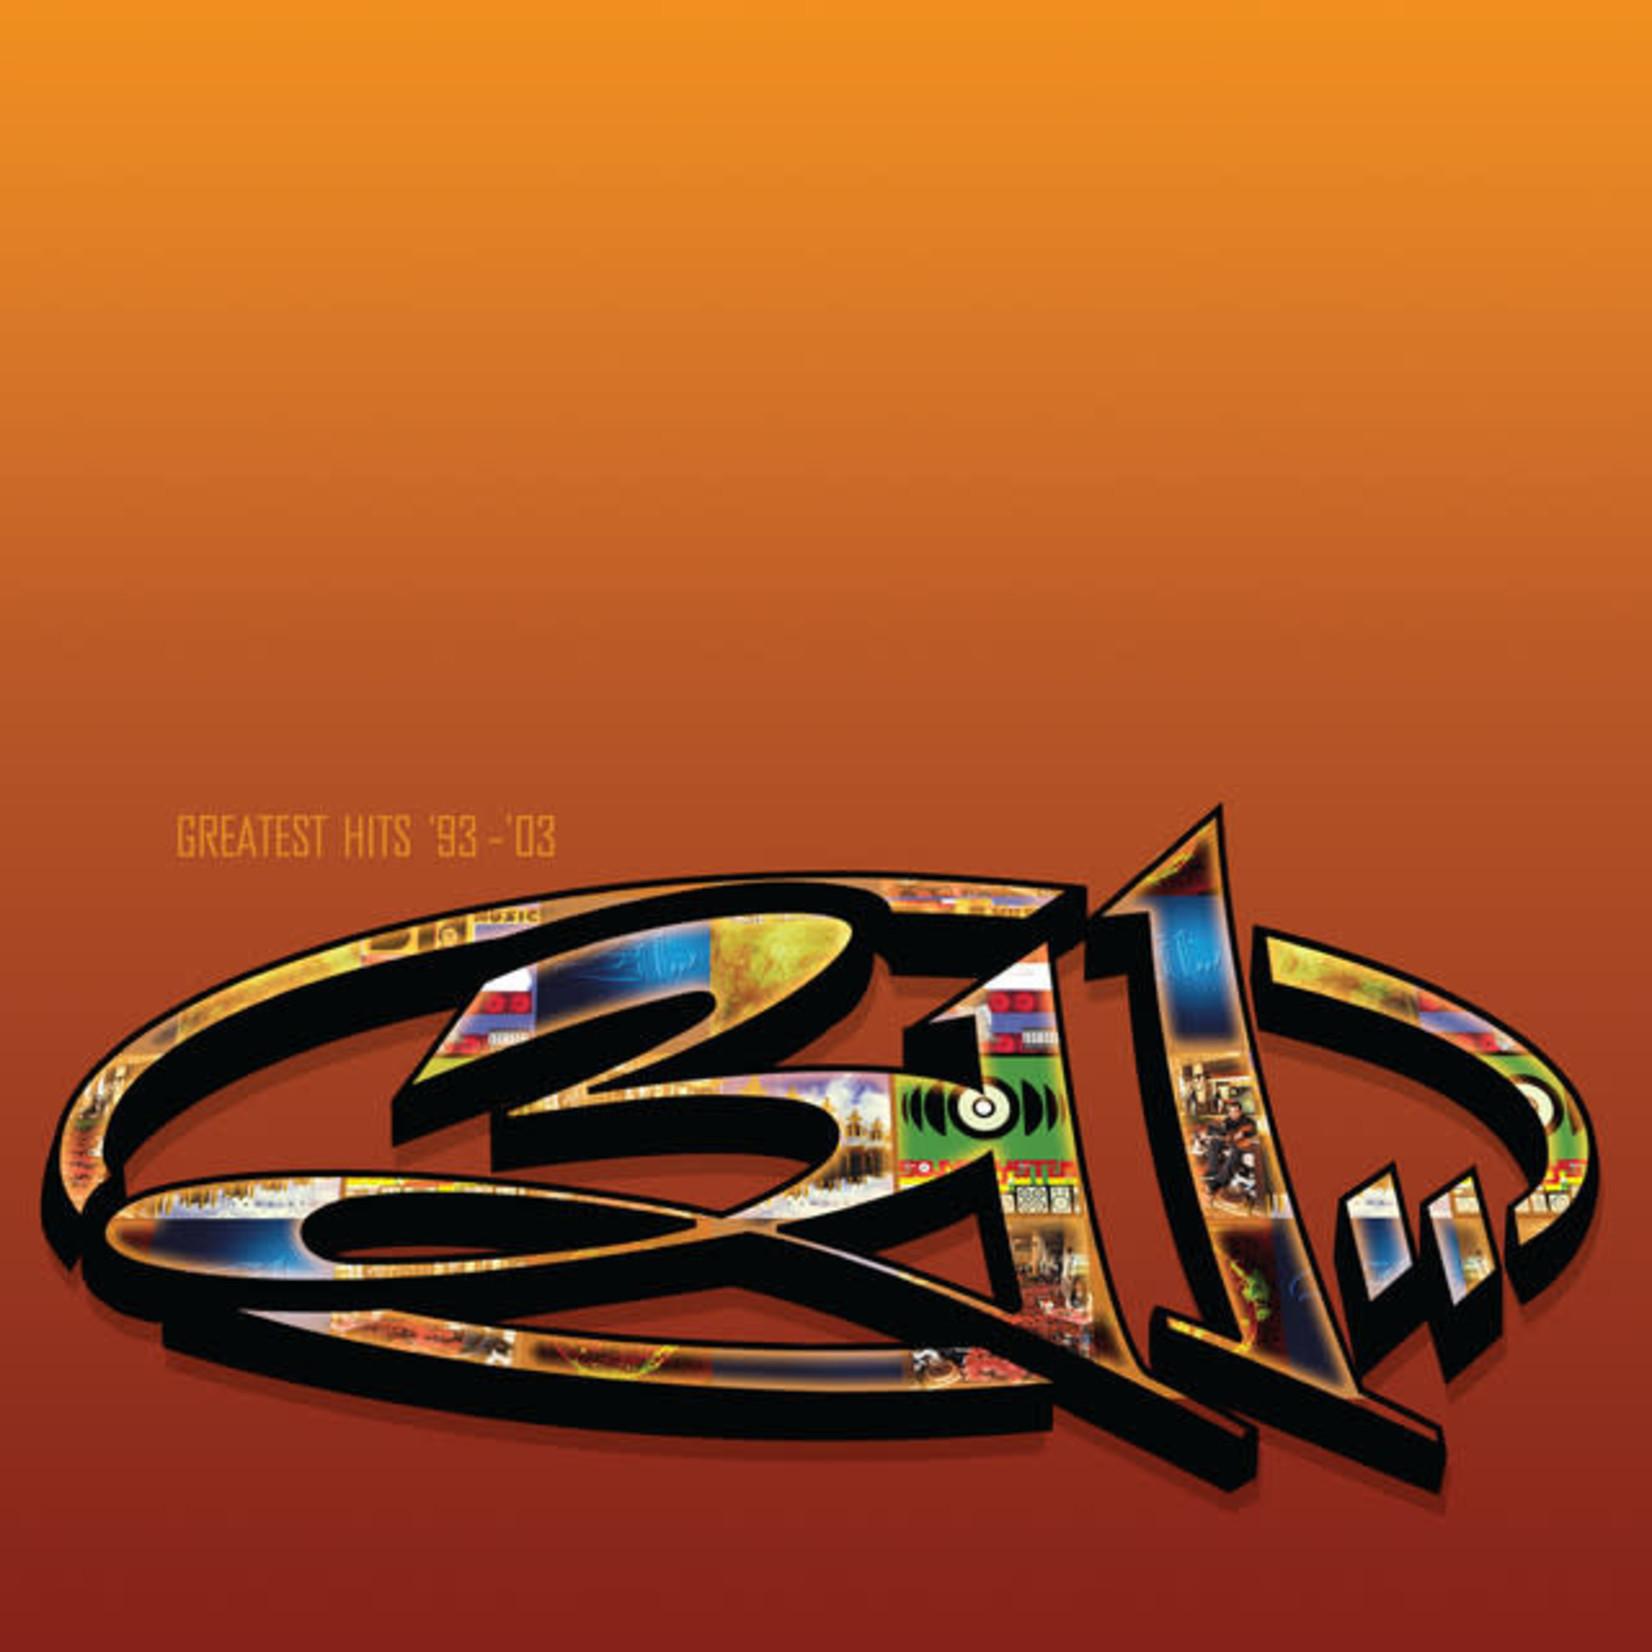 Vinyl 311 - Greatest Hits.  Final Sale